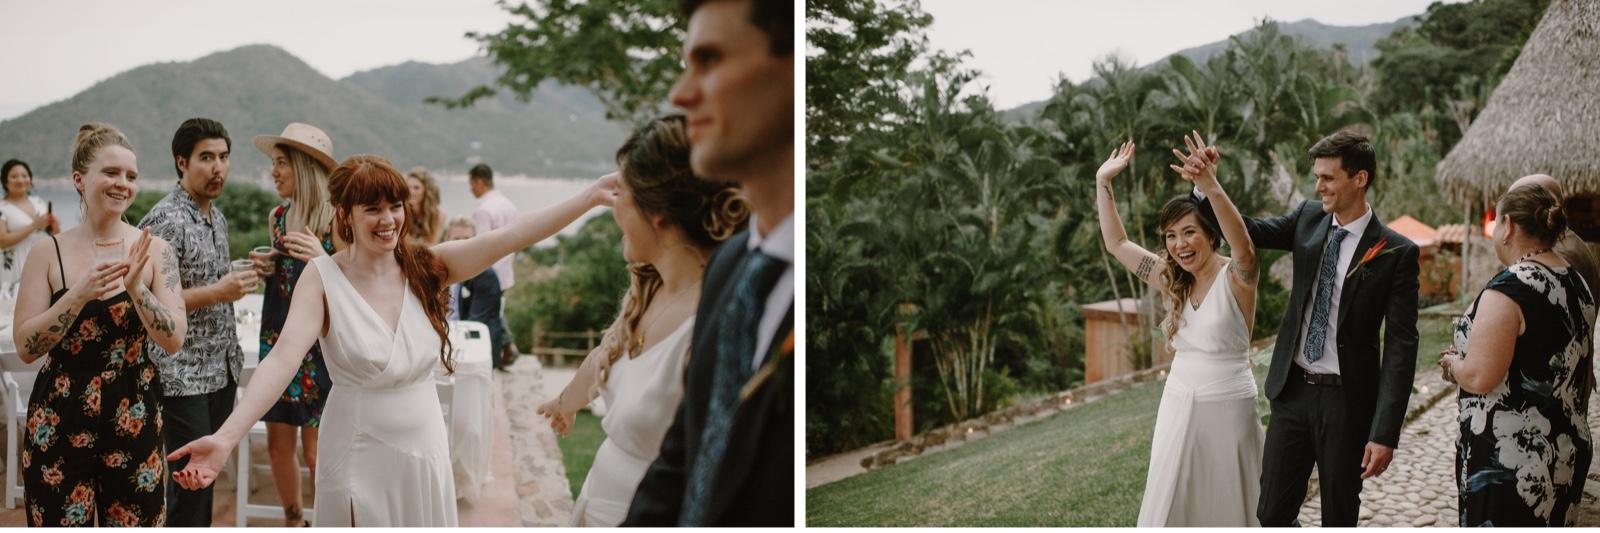 Yelapa_Verana_Wedding_106.JPG